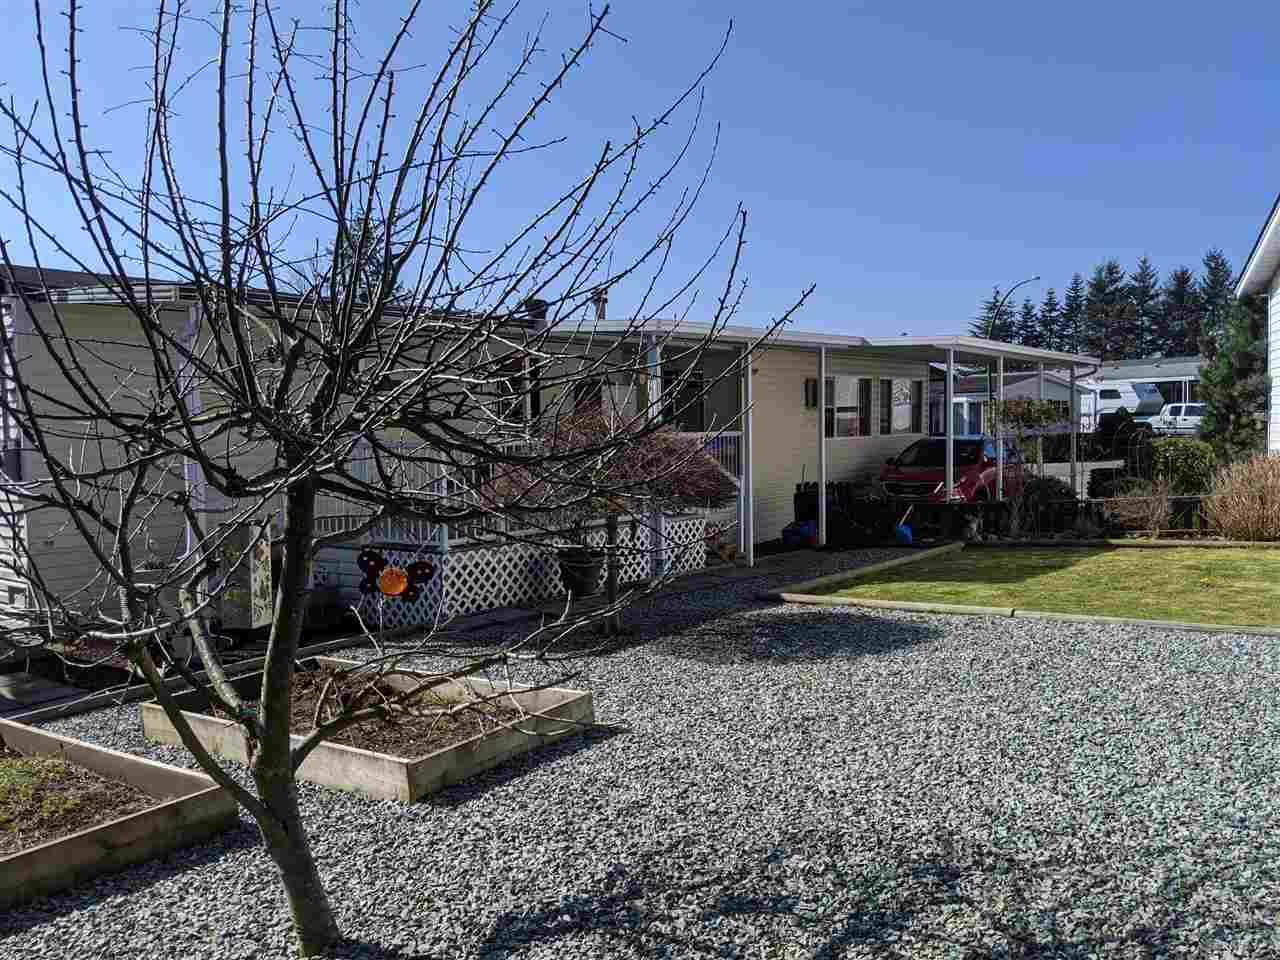 20 27111 0 AVENUE - Aldergrove Langley House/Single Family for sale, 2 Bedrooms (R2446736) #3